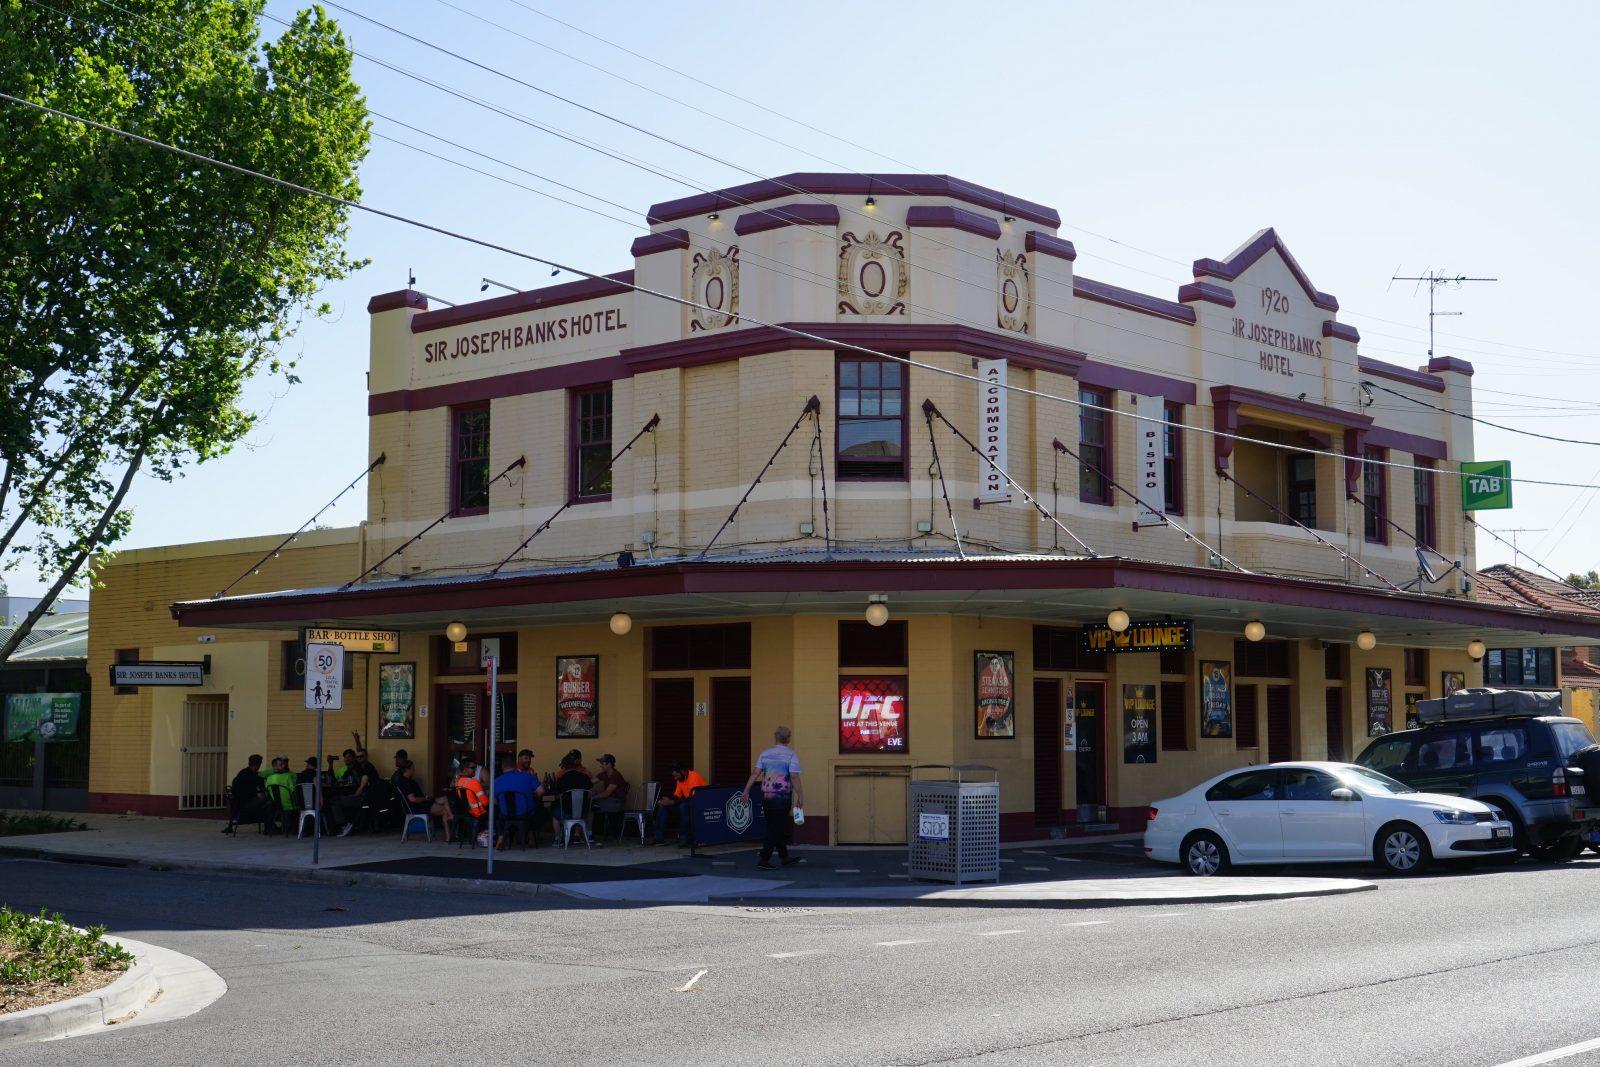 Sir Joseph Banks Hotel Exterior